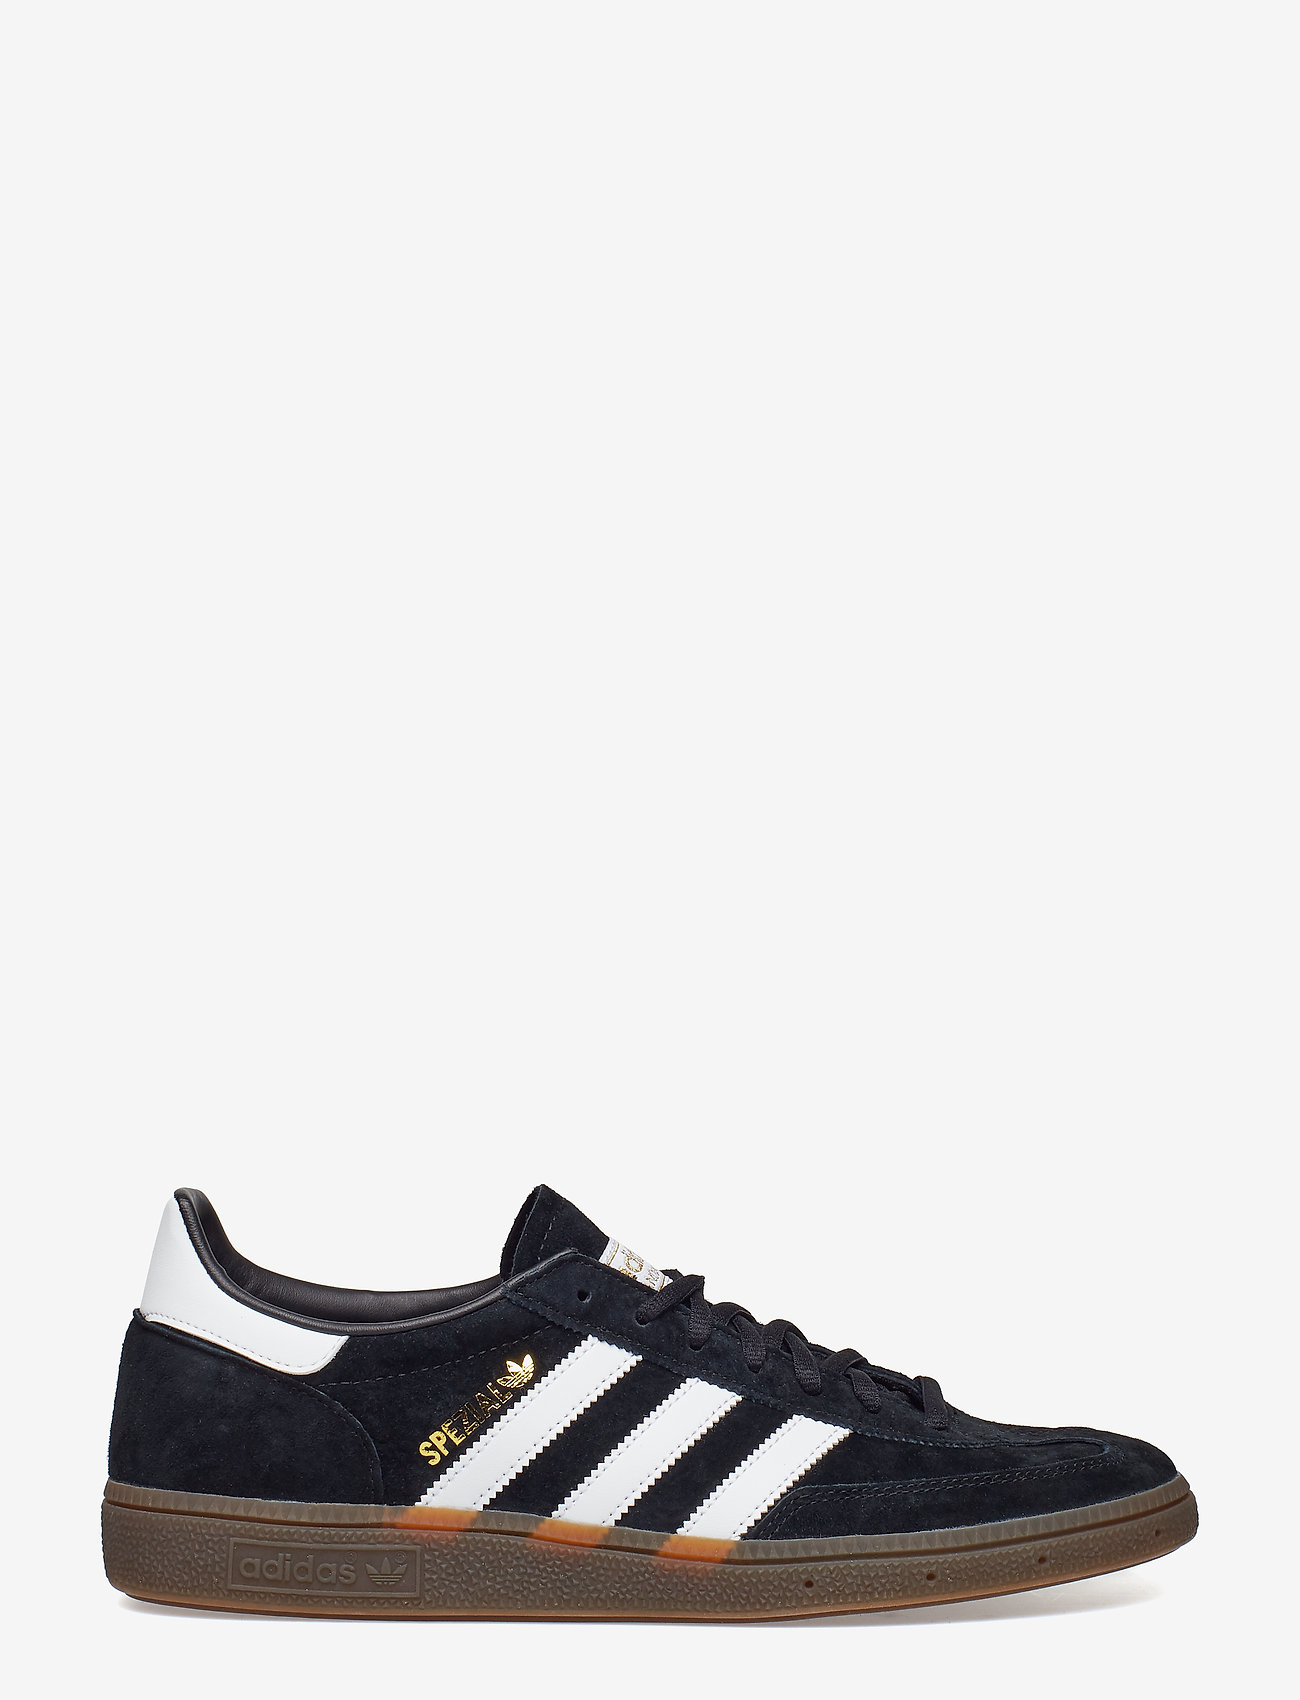 adidas Originals - Handball Spezial - lav ankel - cblack/ftwwht/gum5 - 1